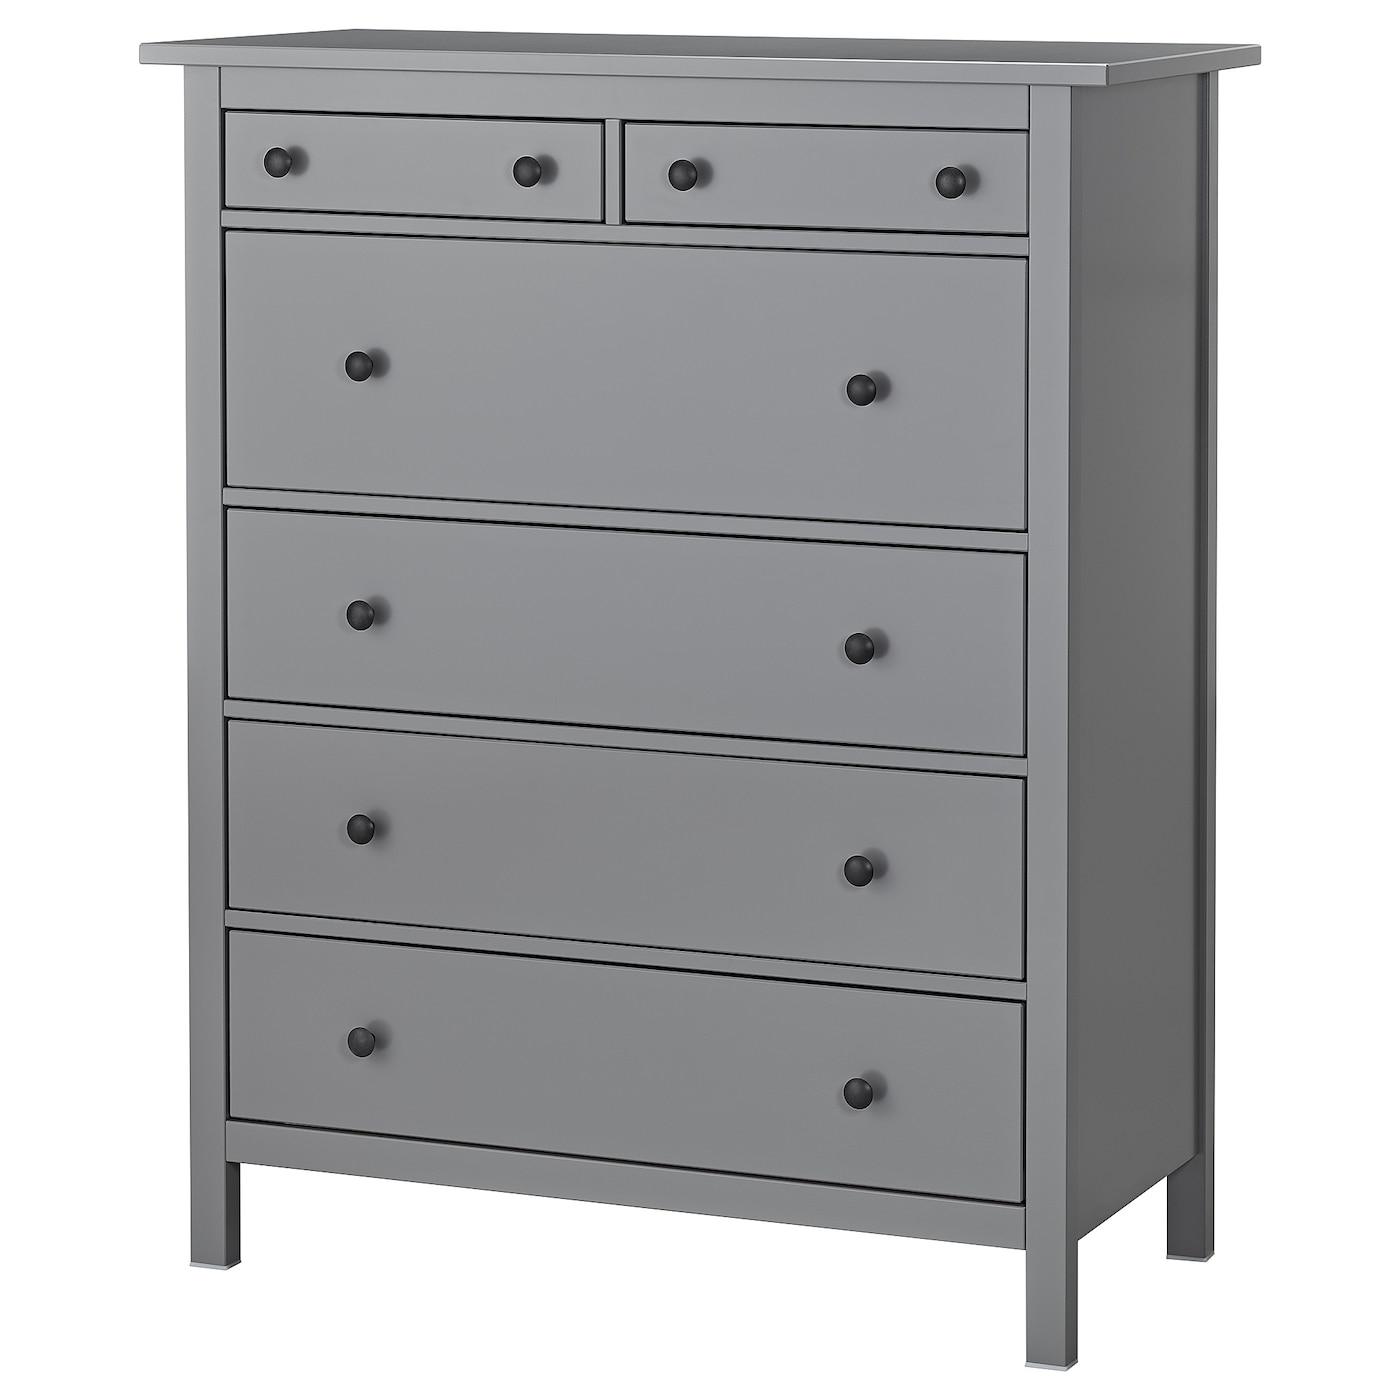 HEMNES Chest of 7 drawers - grey 7x7 cm